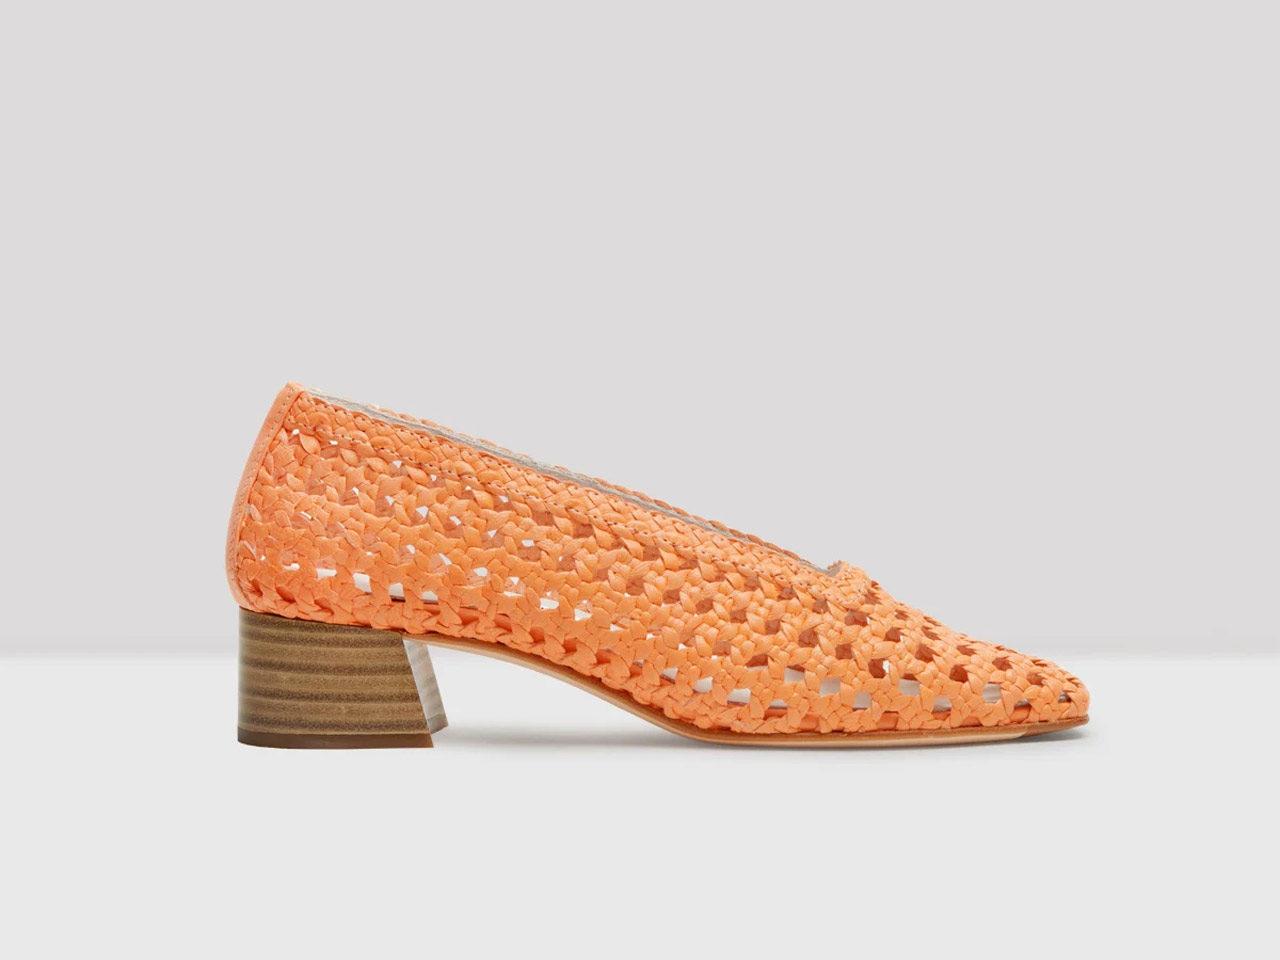 Missta chaussures cuir tressé